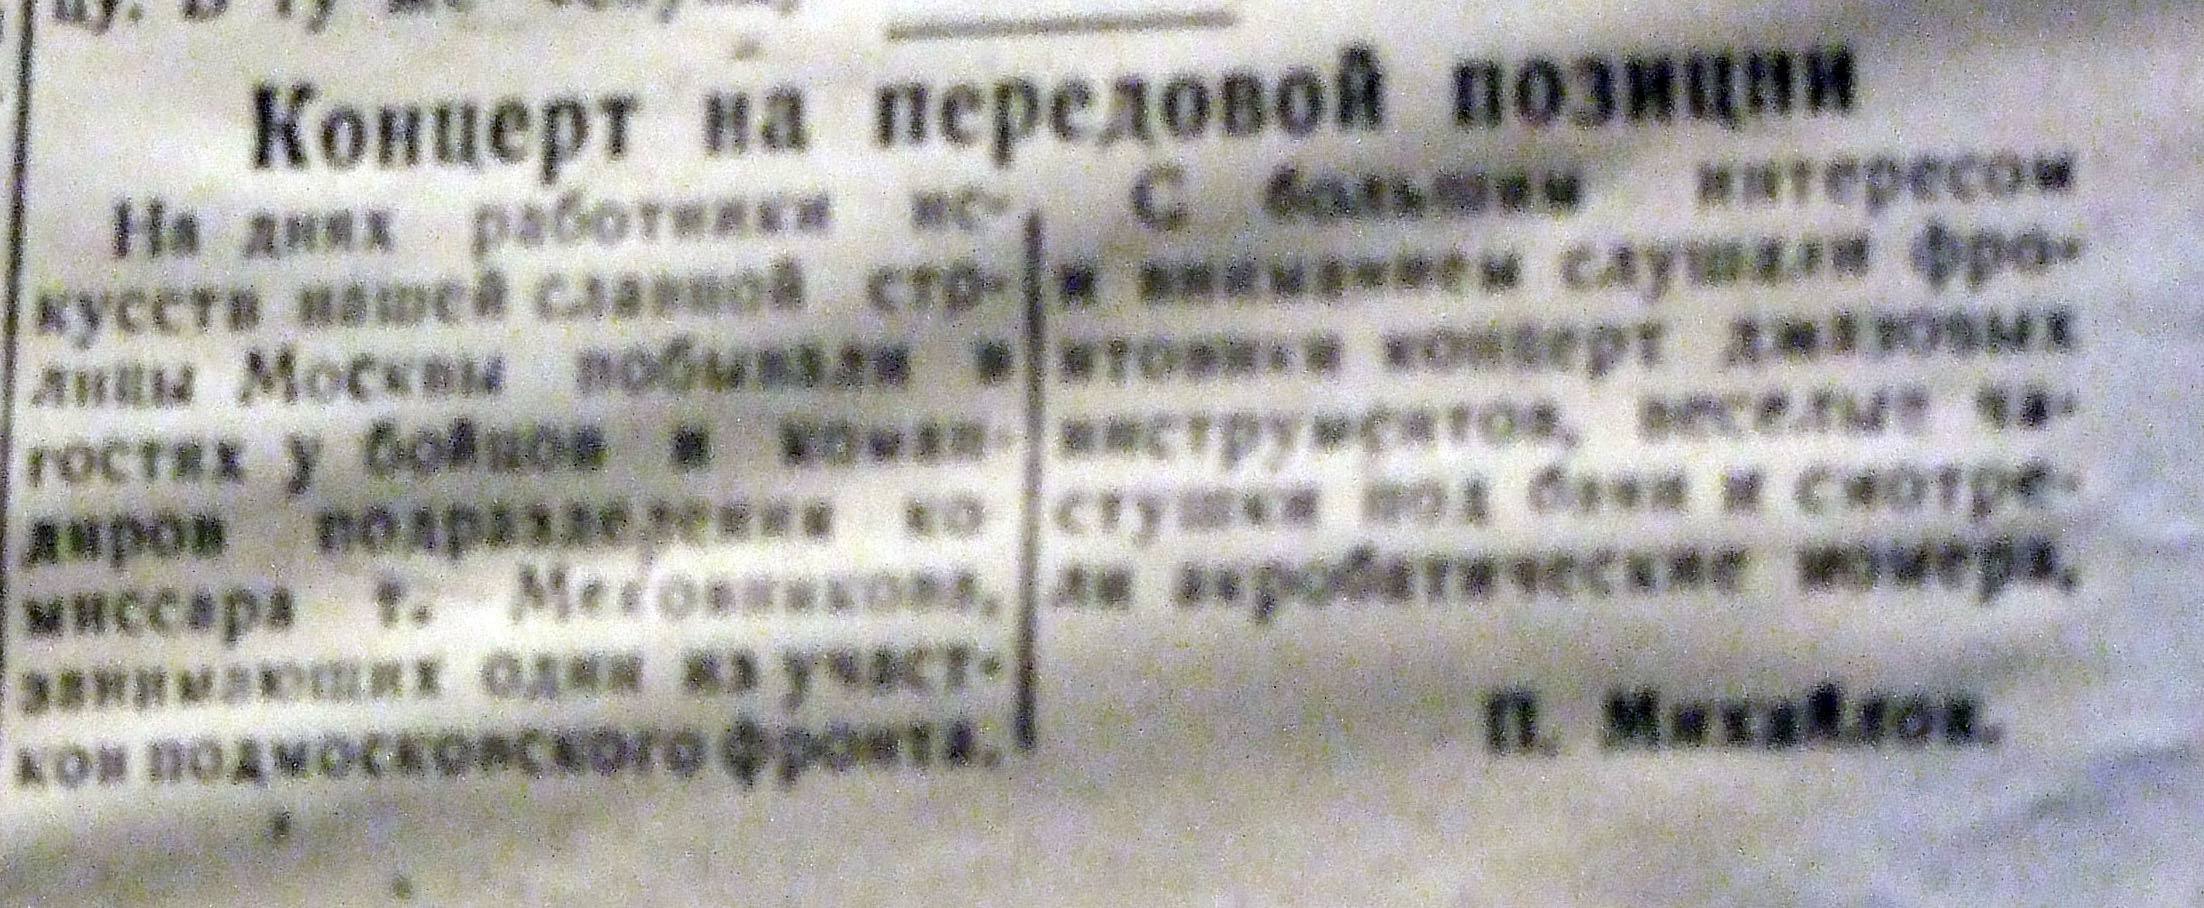 http://s1.uploads.ru/OgjEs.jpg